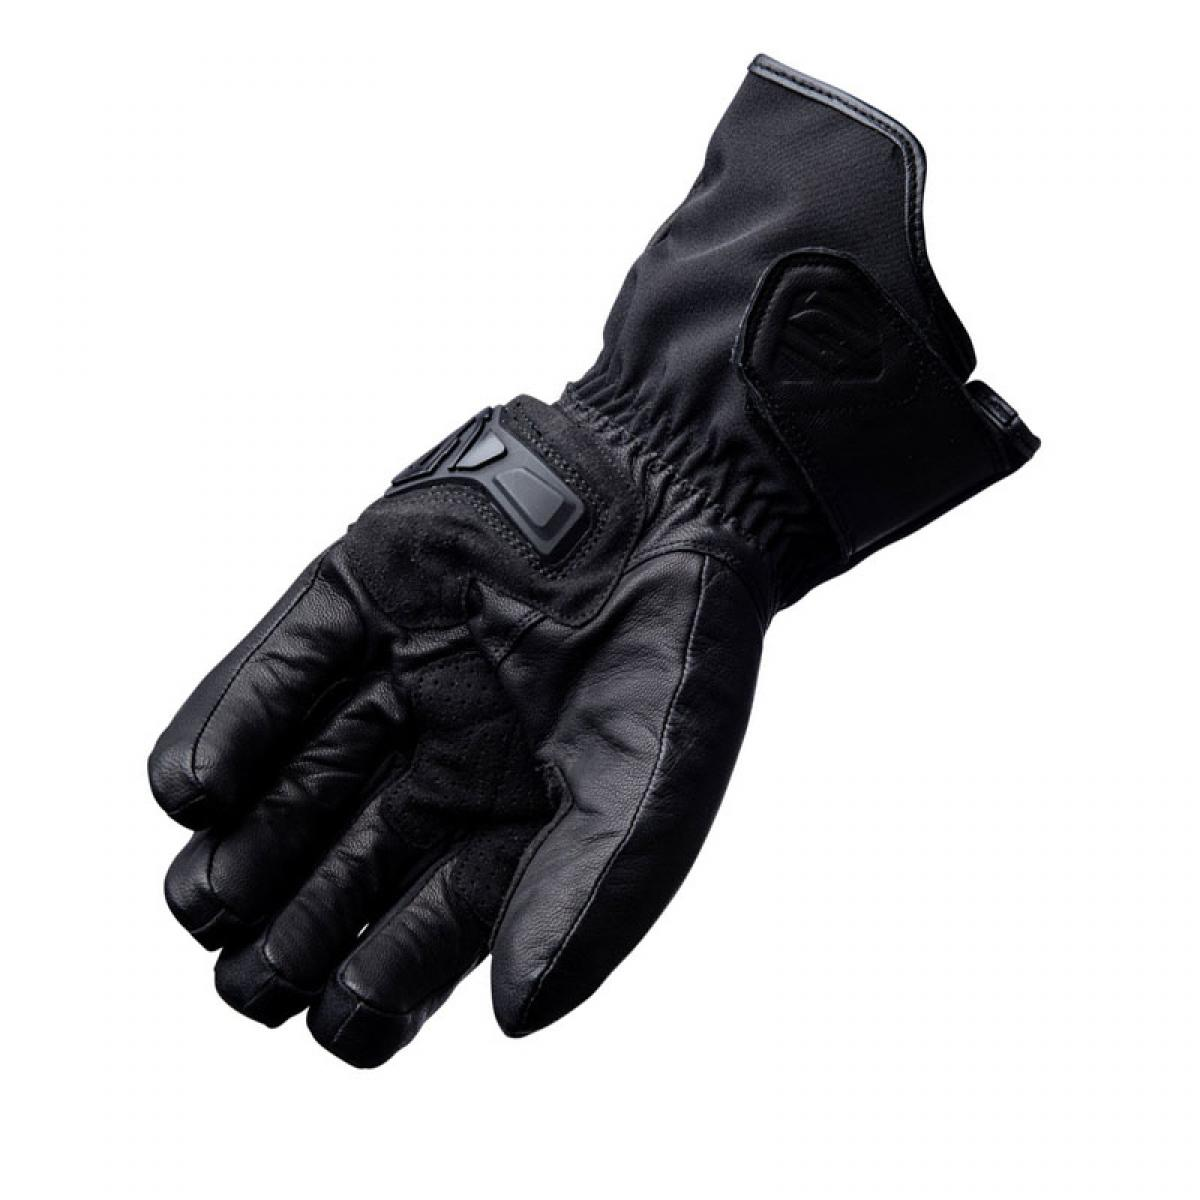 Five WFX Skin Minus Zero Waterproof Motorcycle Thinsulate 270g Thermal Gloves